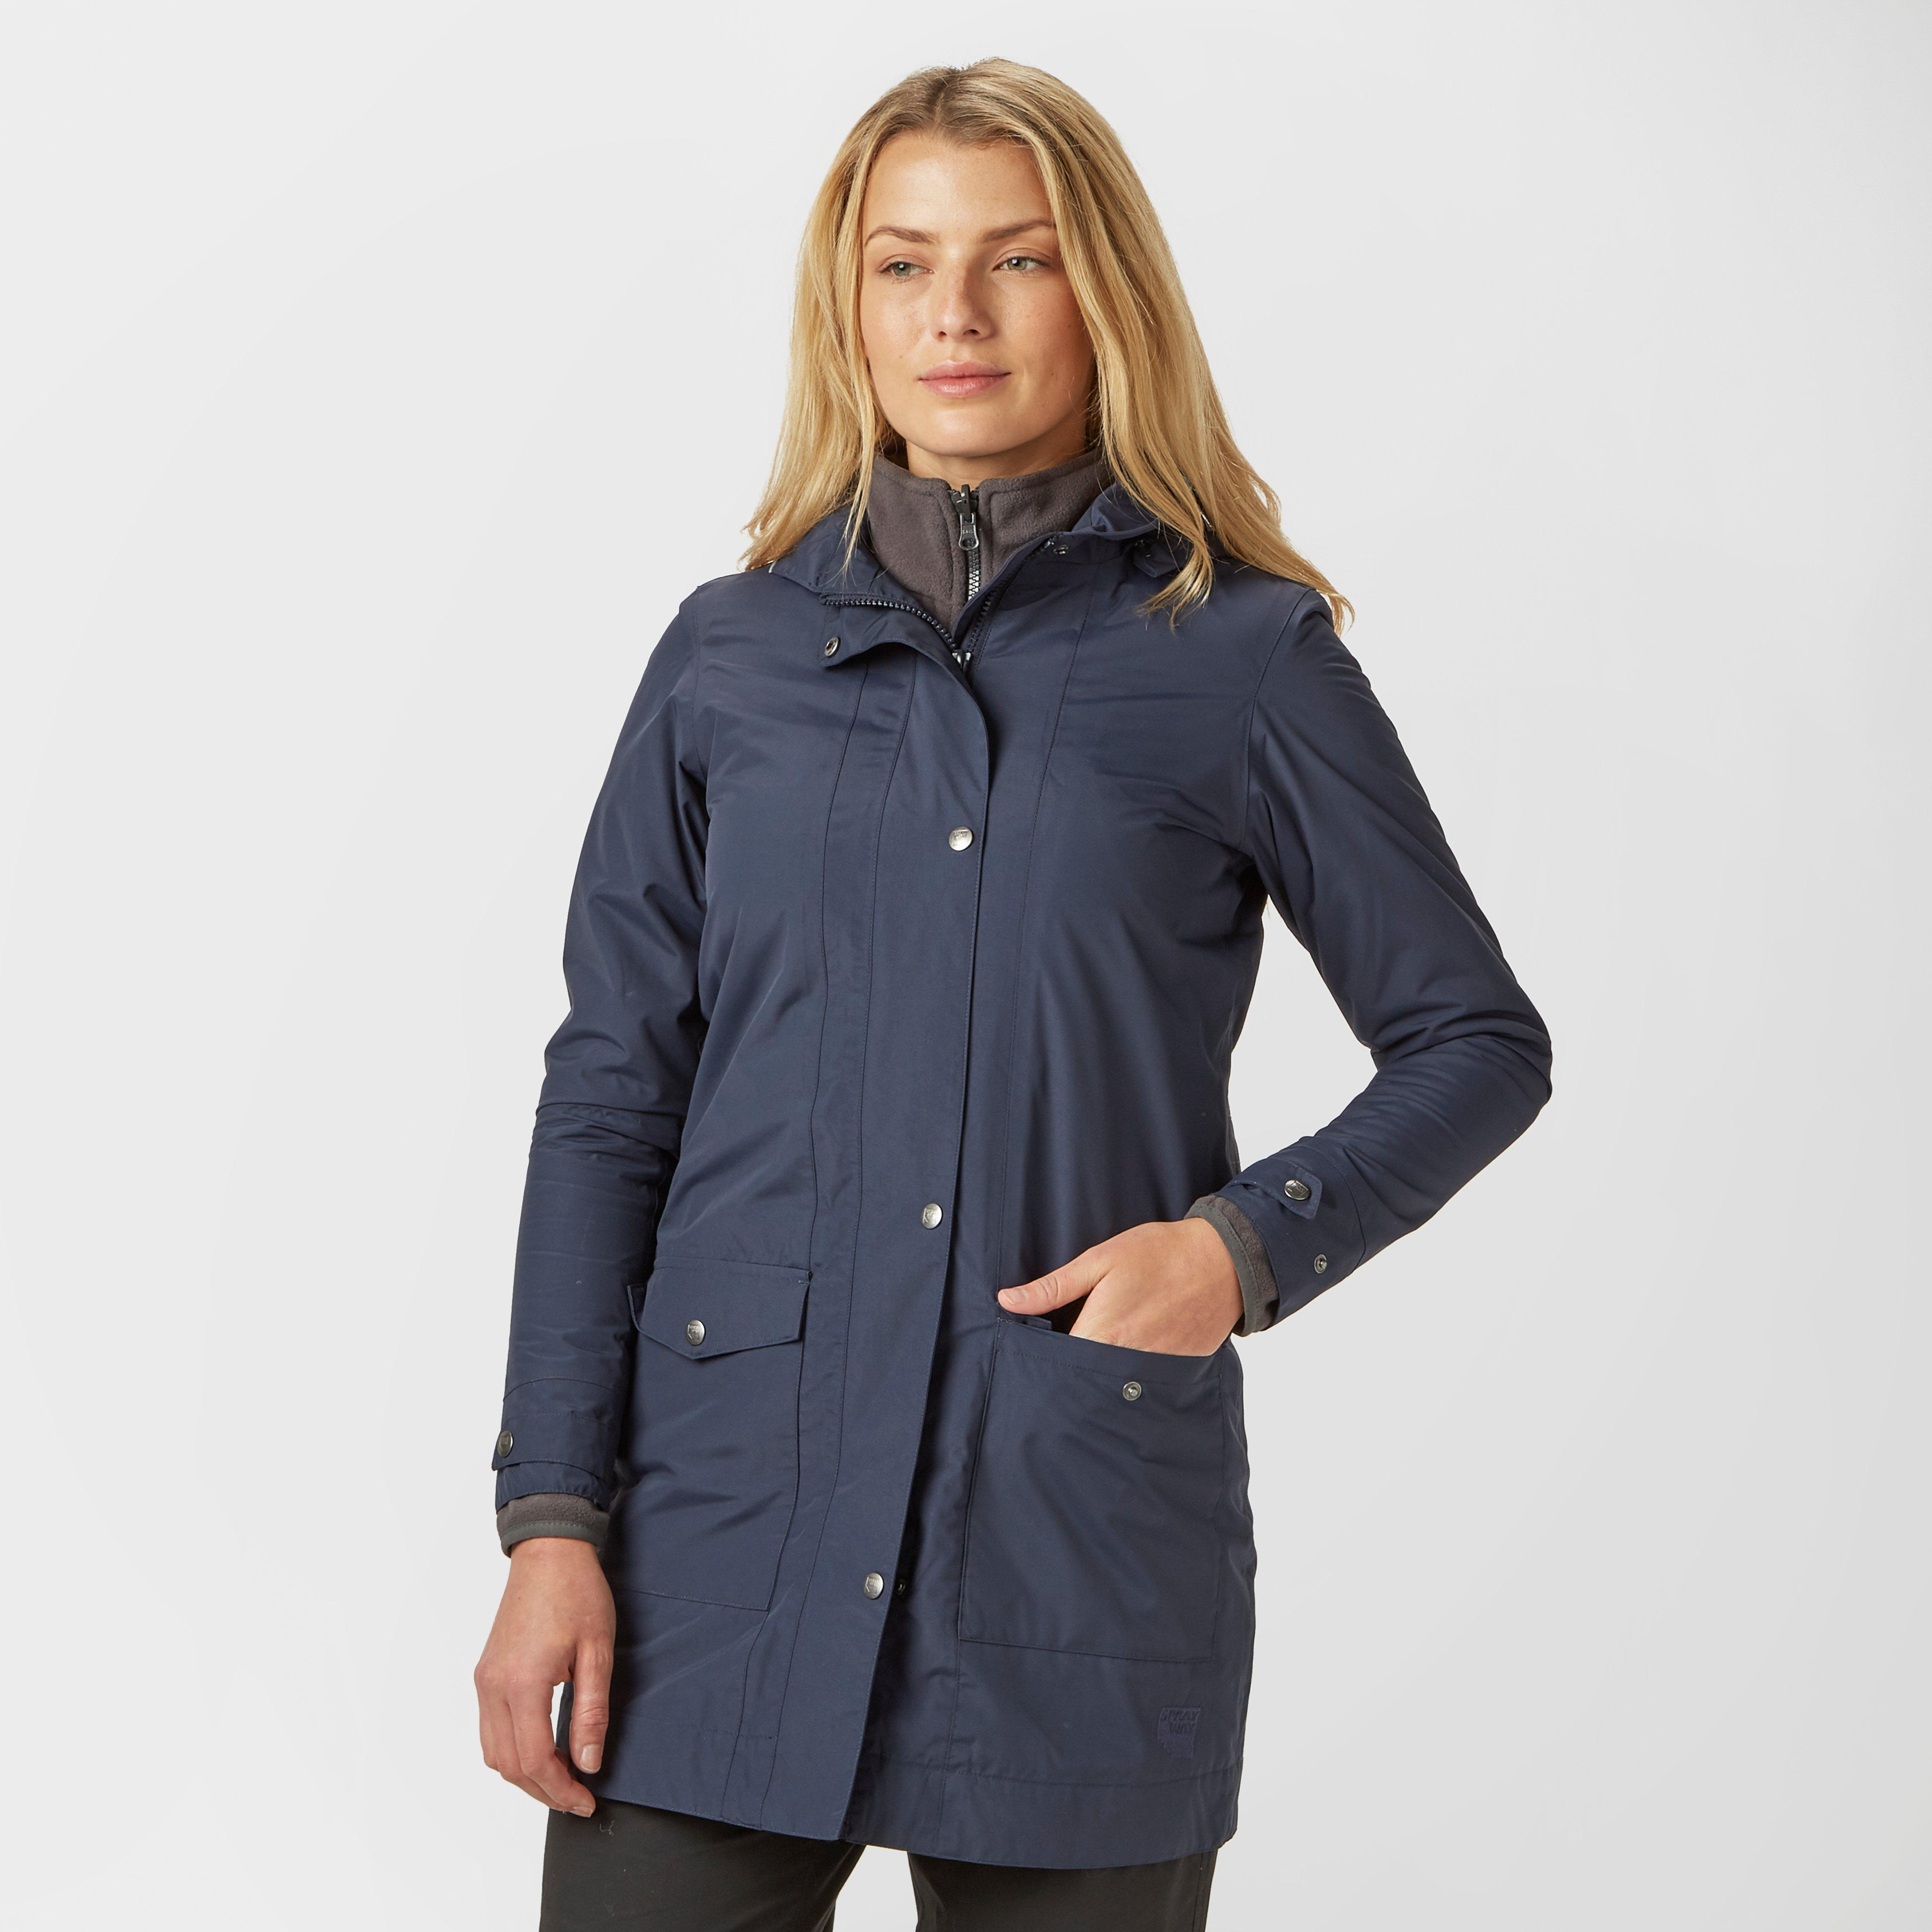 Sprayway Women's Quartz Jacket, Navy